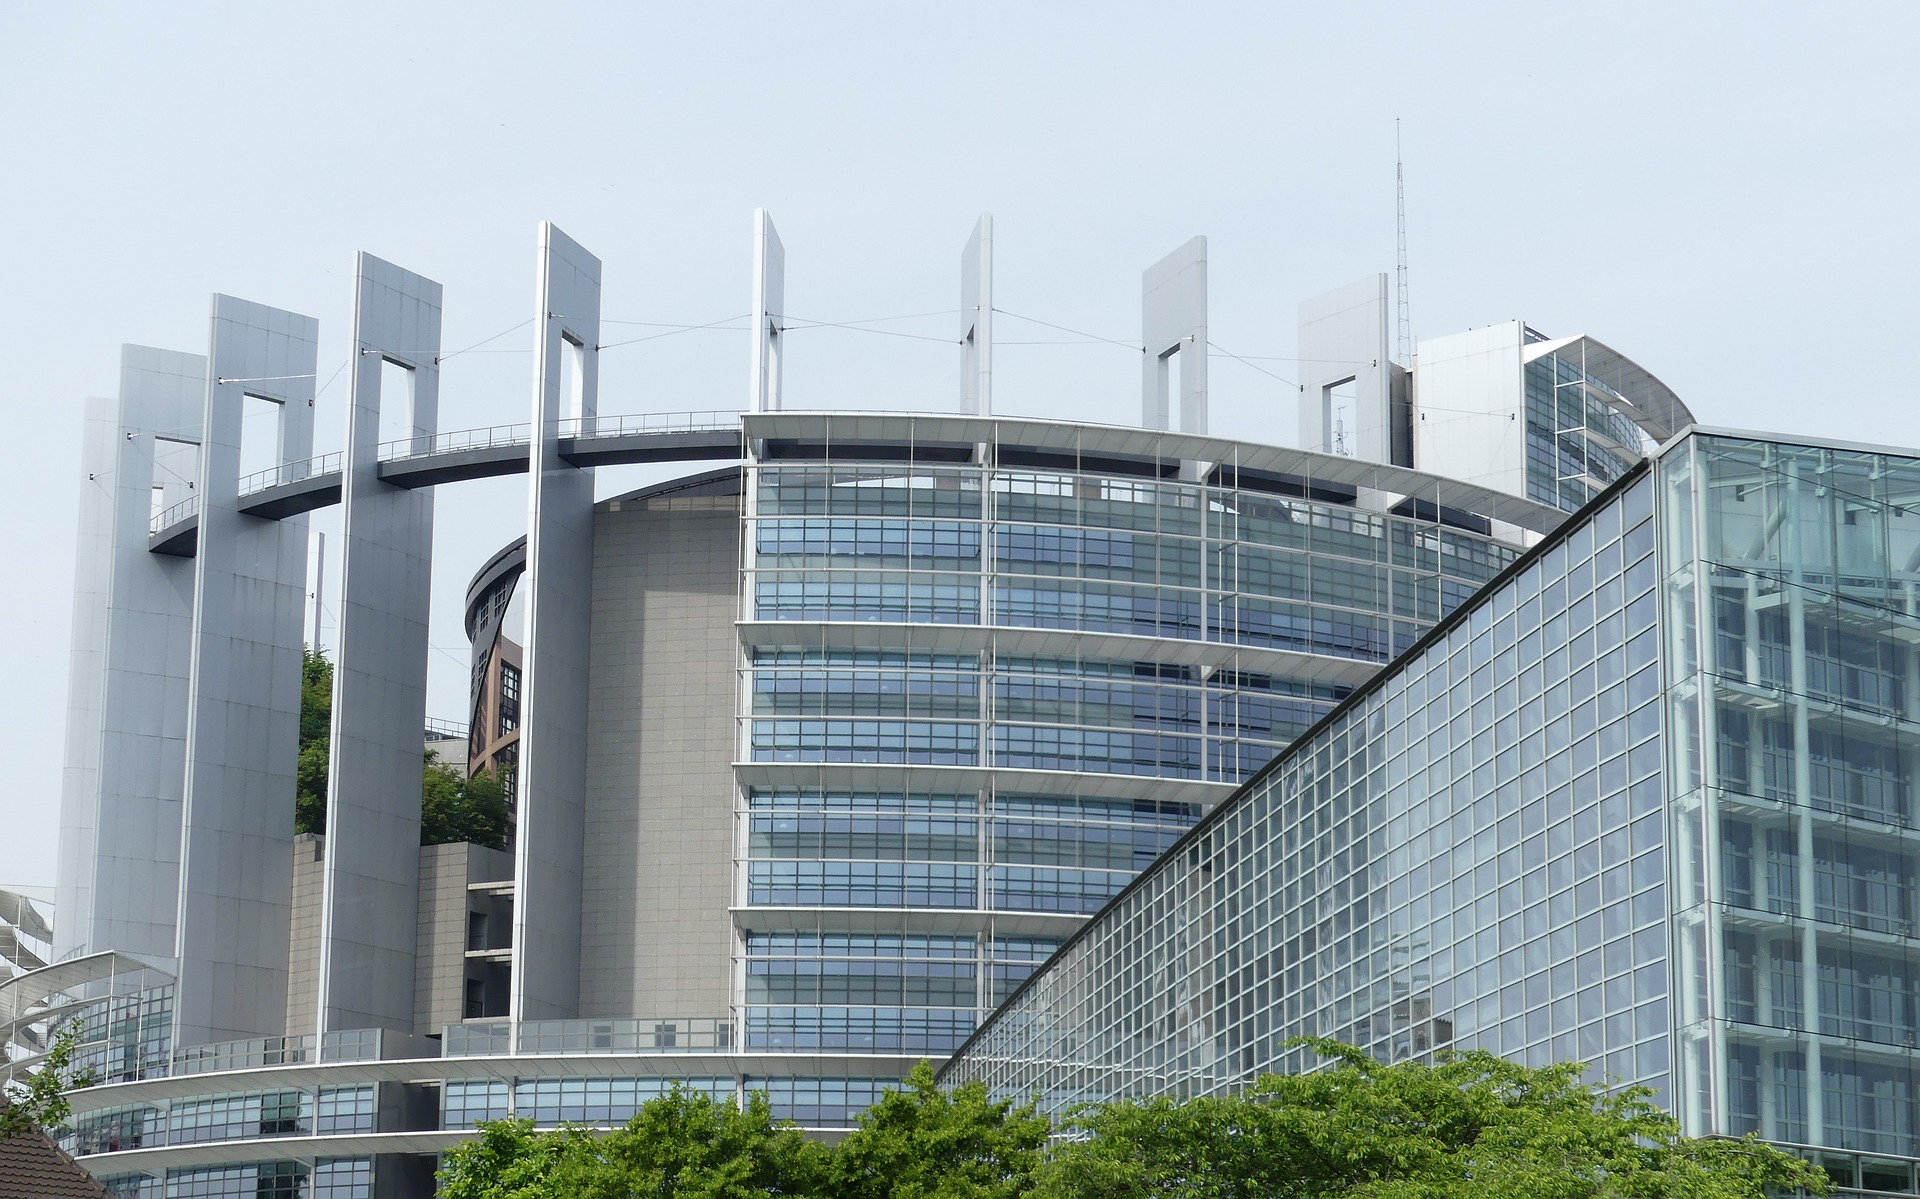 Economic Growth European Union (EU): Freedom of Movement - Development - Unfolding